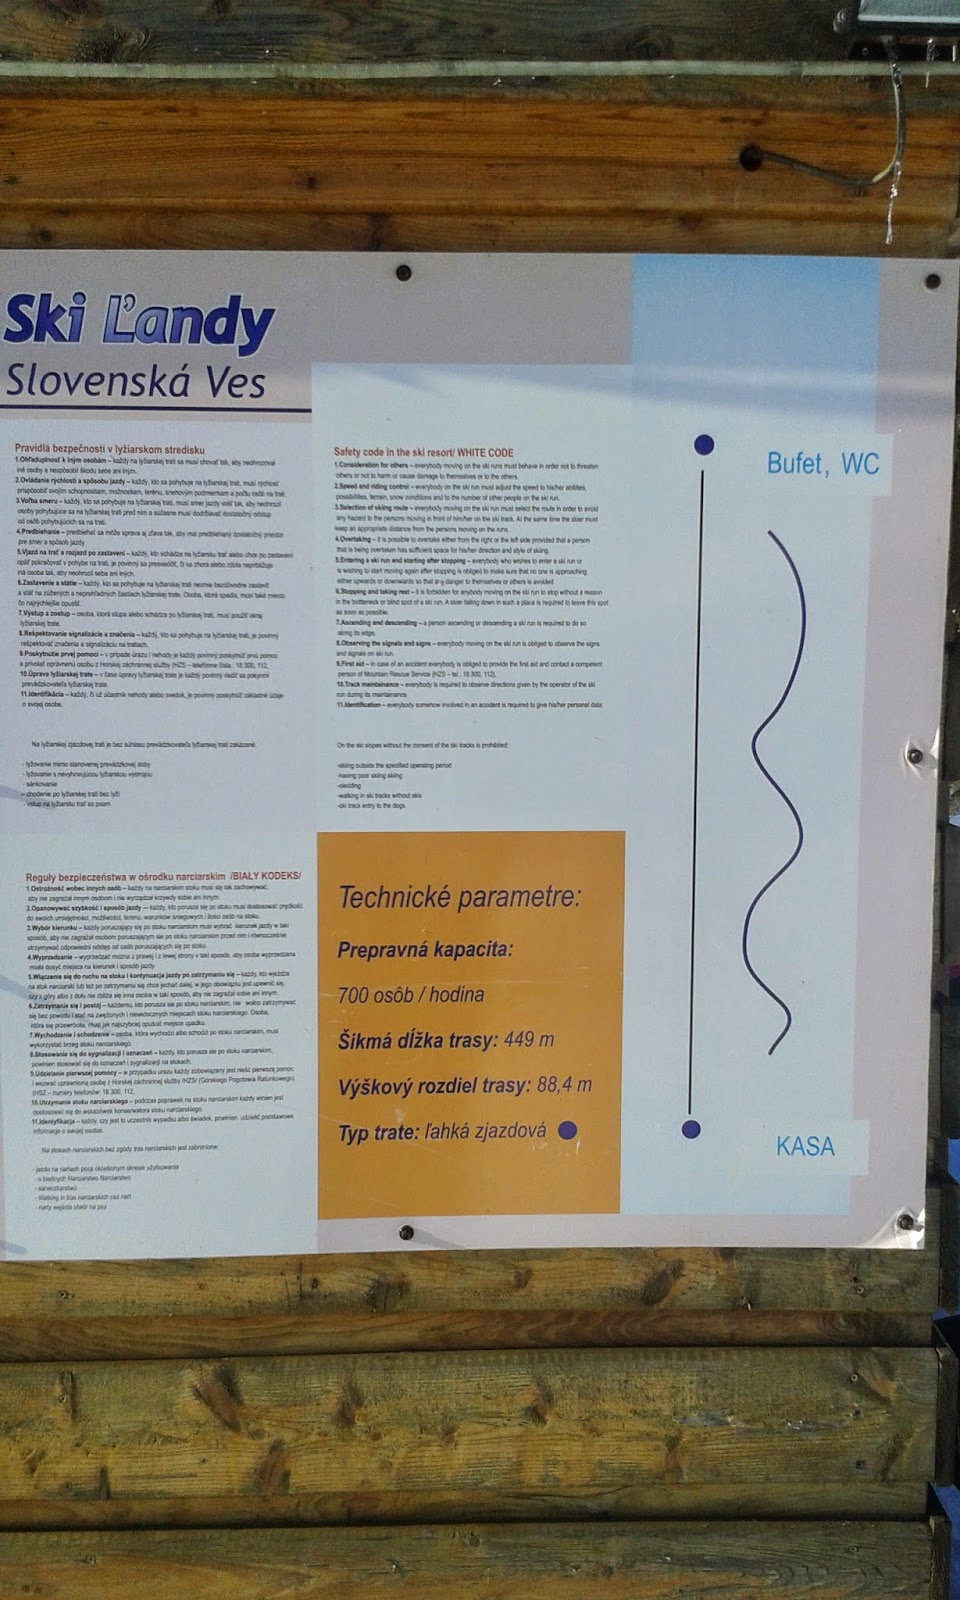 wyciąg i trasa narciarska SKI Slovenská Ves